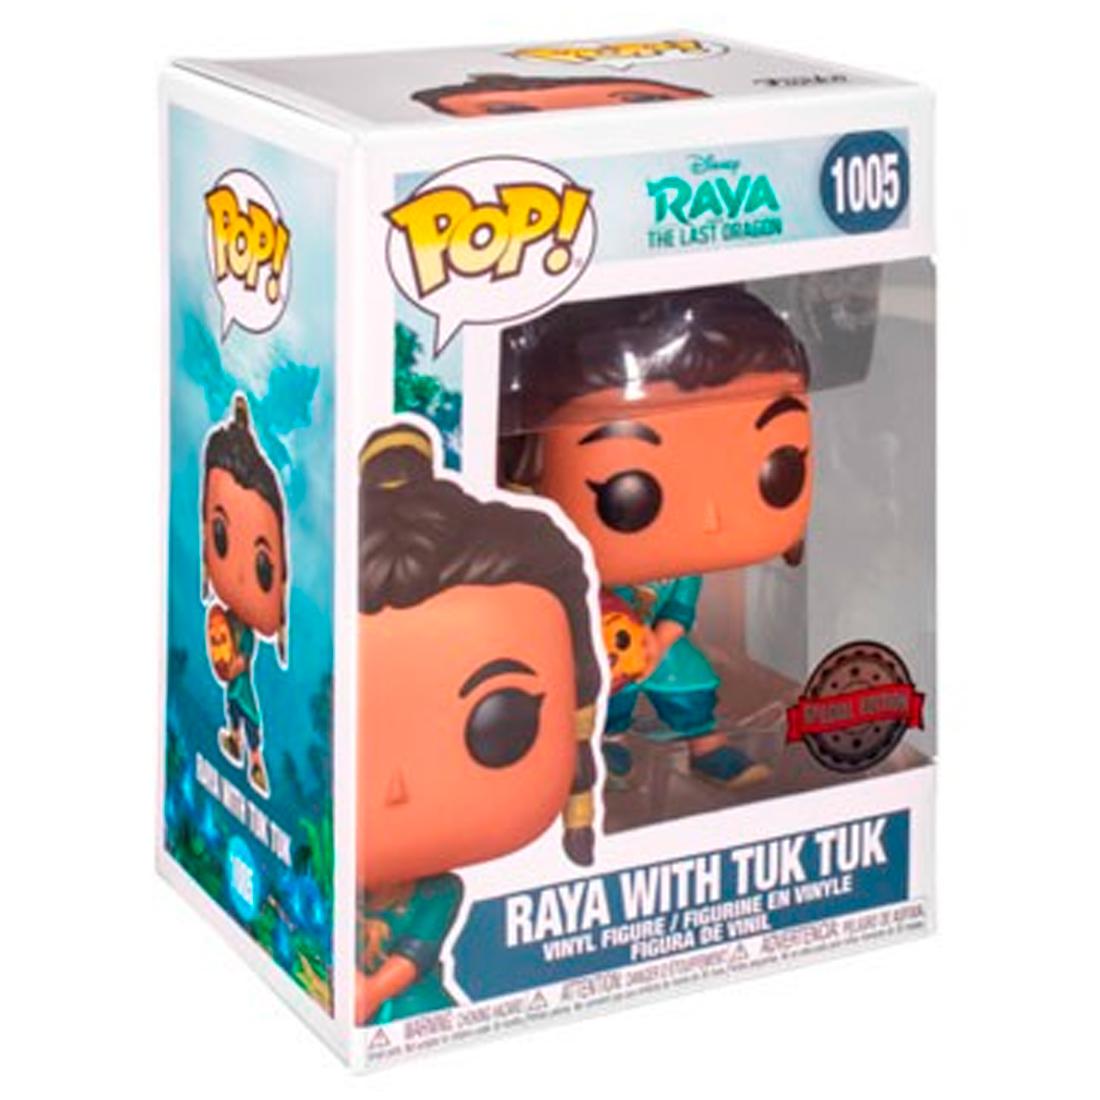 Funko Pop Disney Raya and the Last Dragon 1005 Raya With Tuk Tuk Special Edition